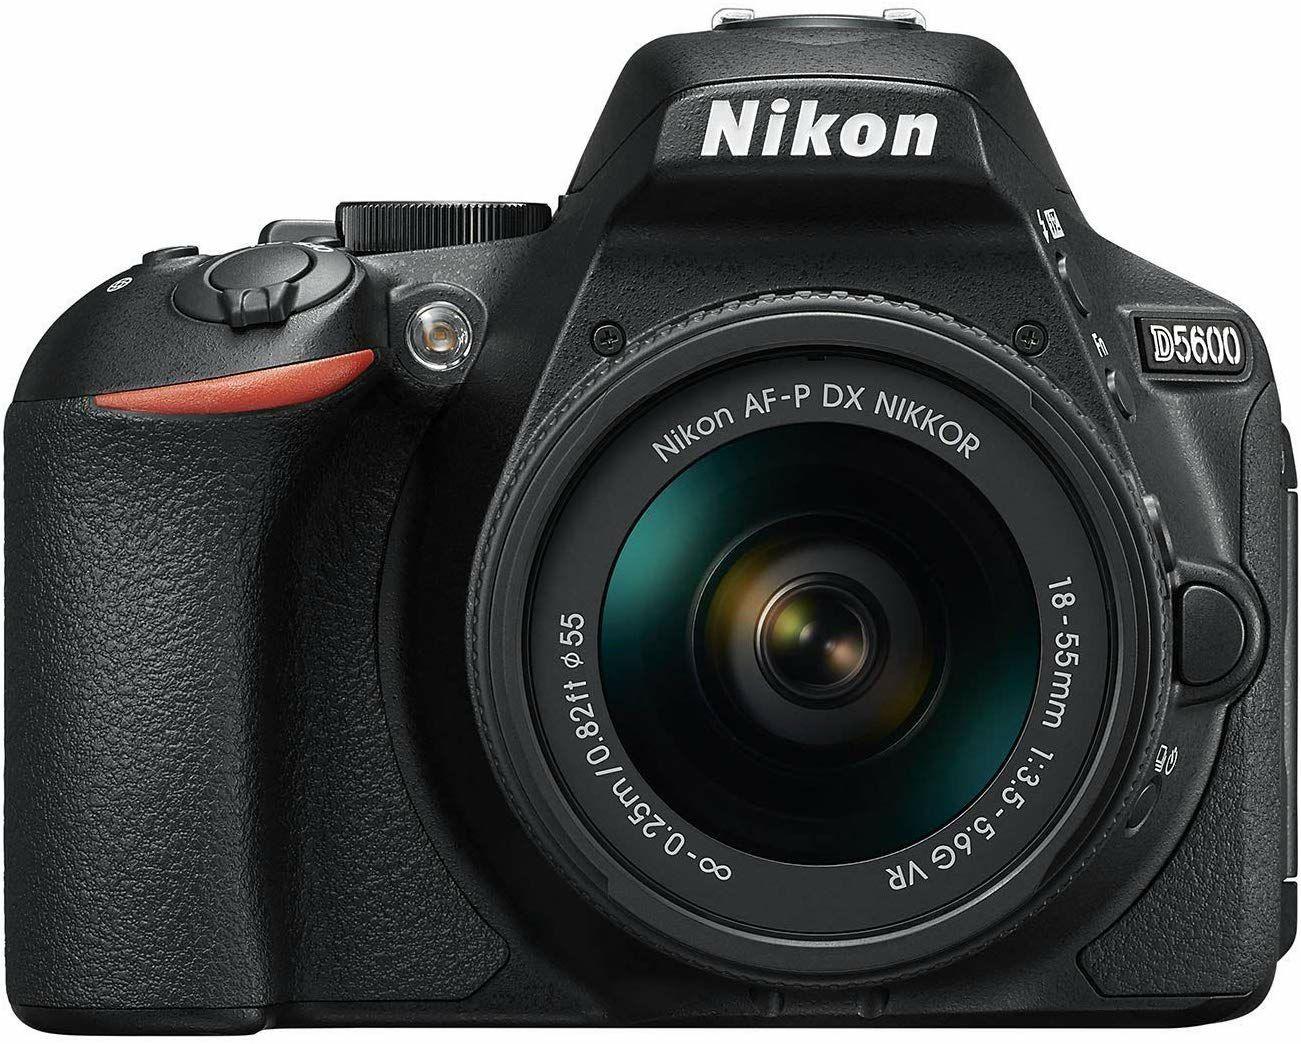 Nikon D5600 icm 18-55 lens